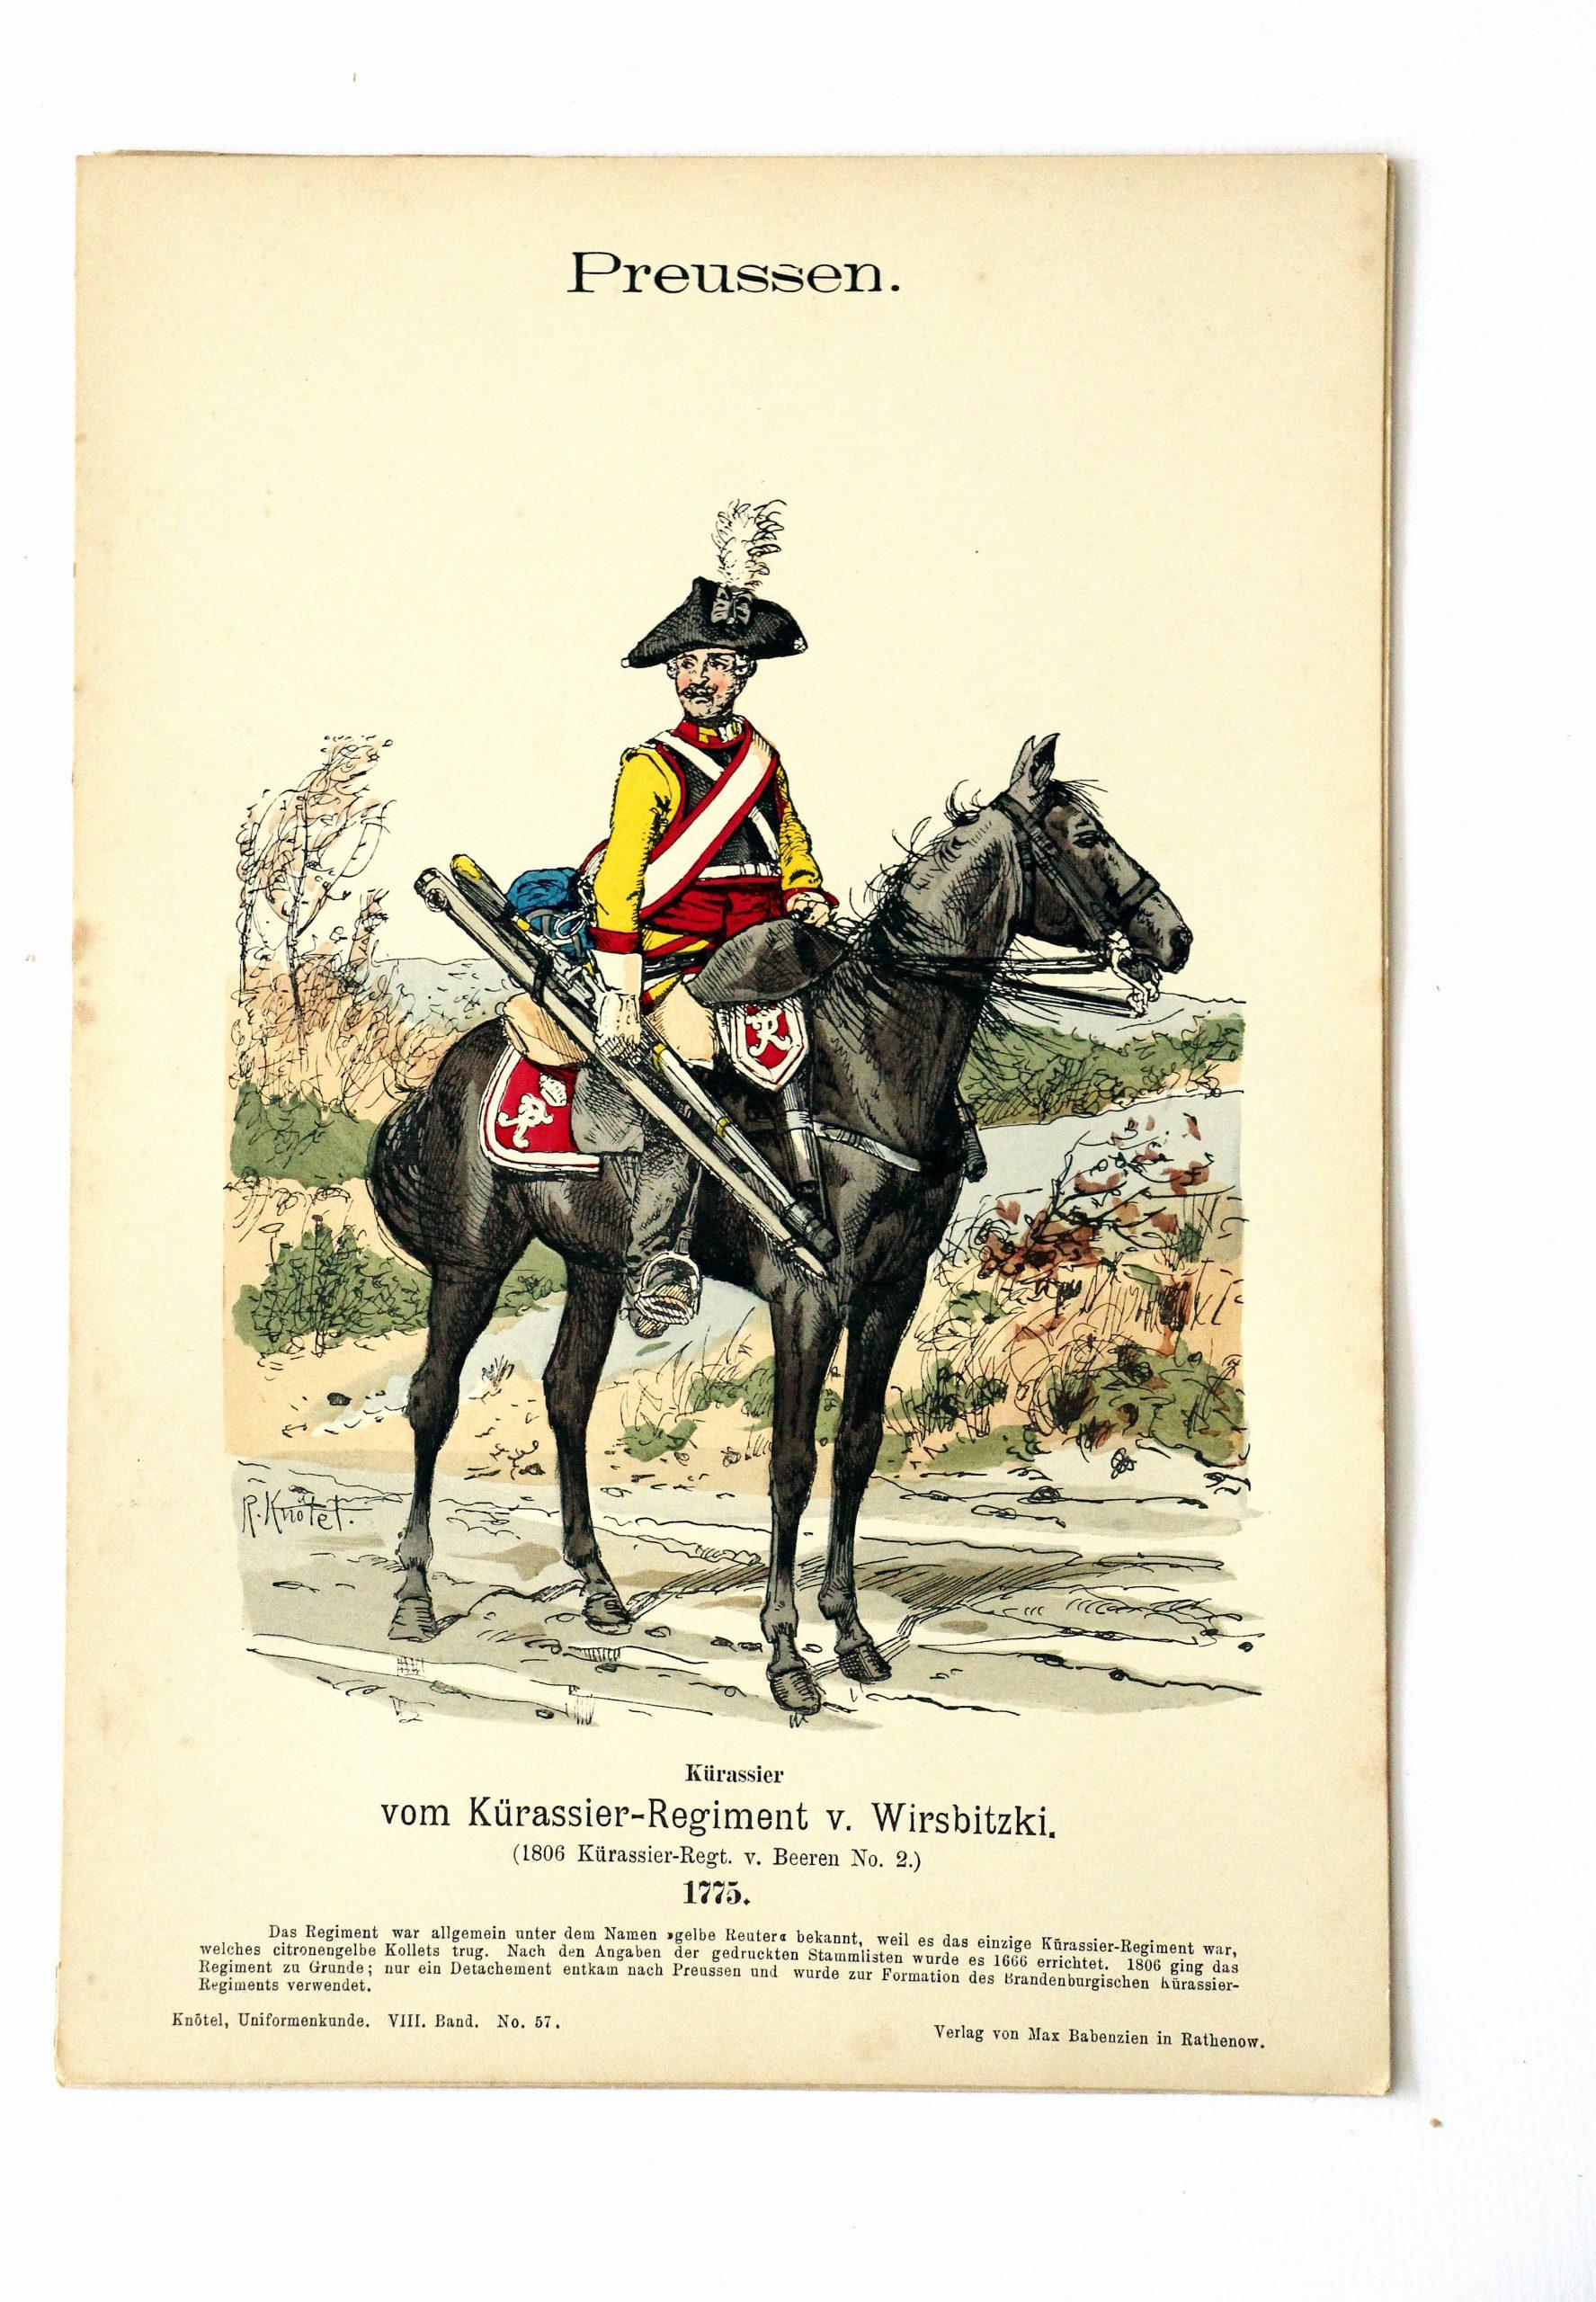 Preussen - Uniformenkunde - Richard Knoetel - VIII - Planche 57